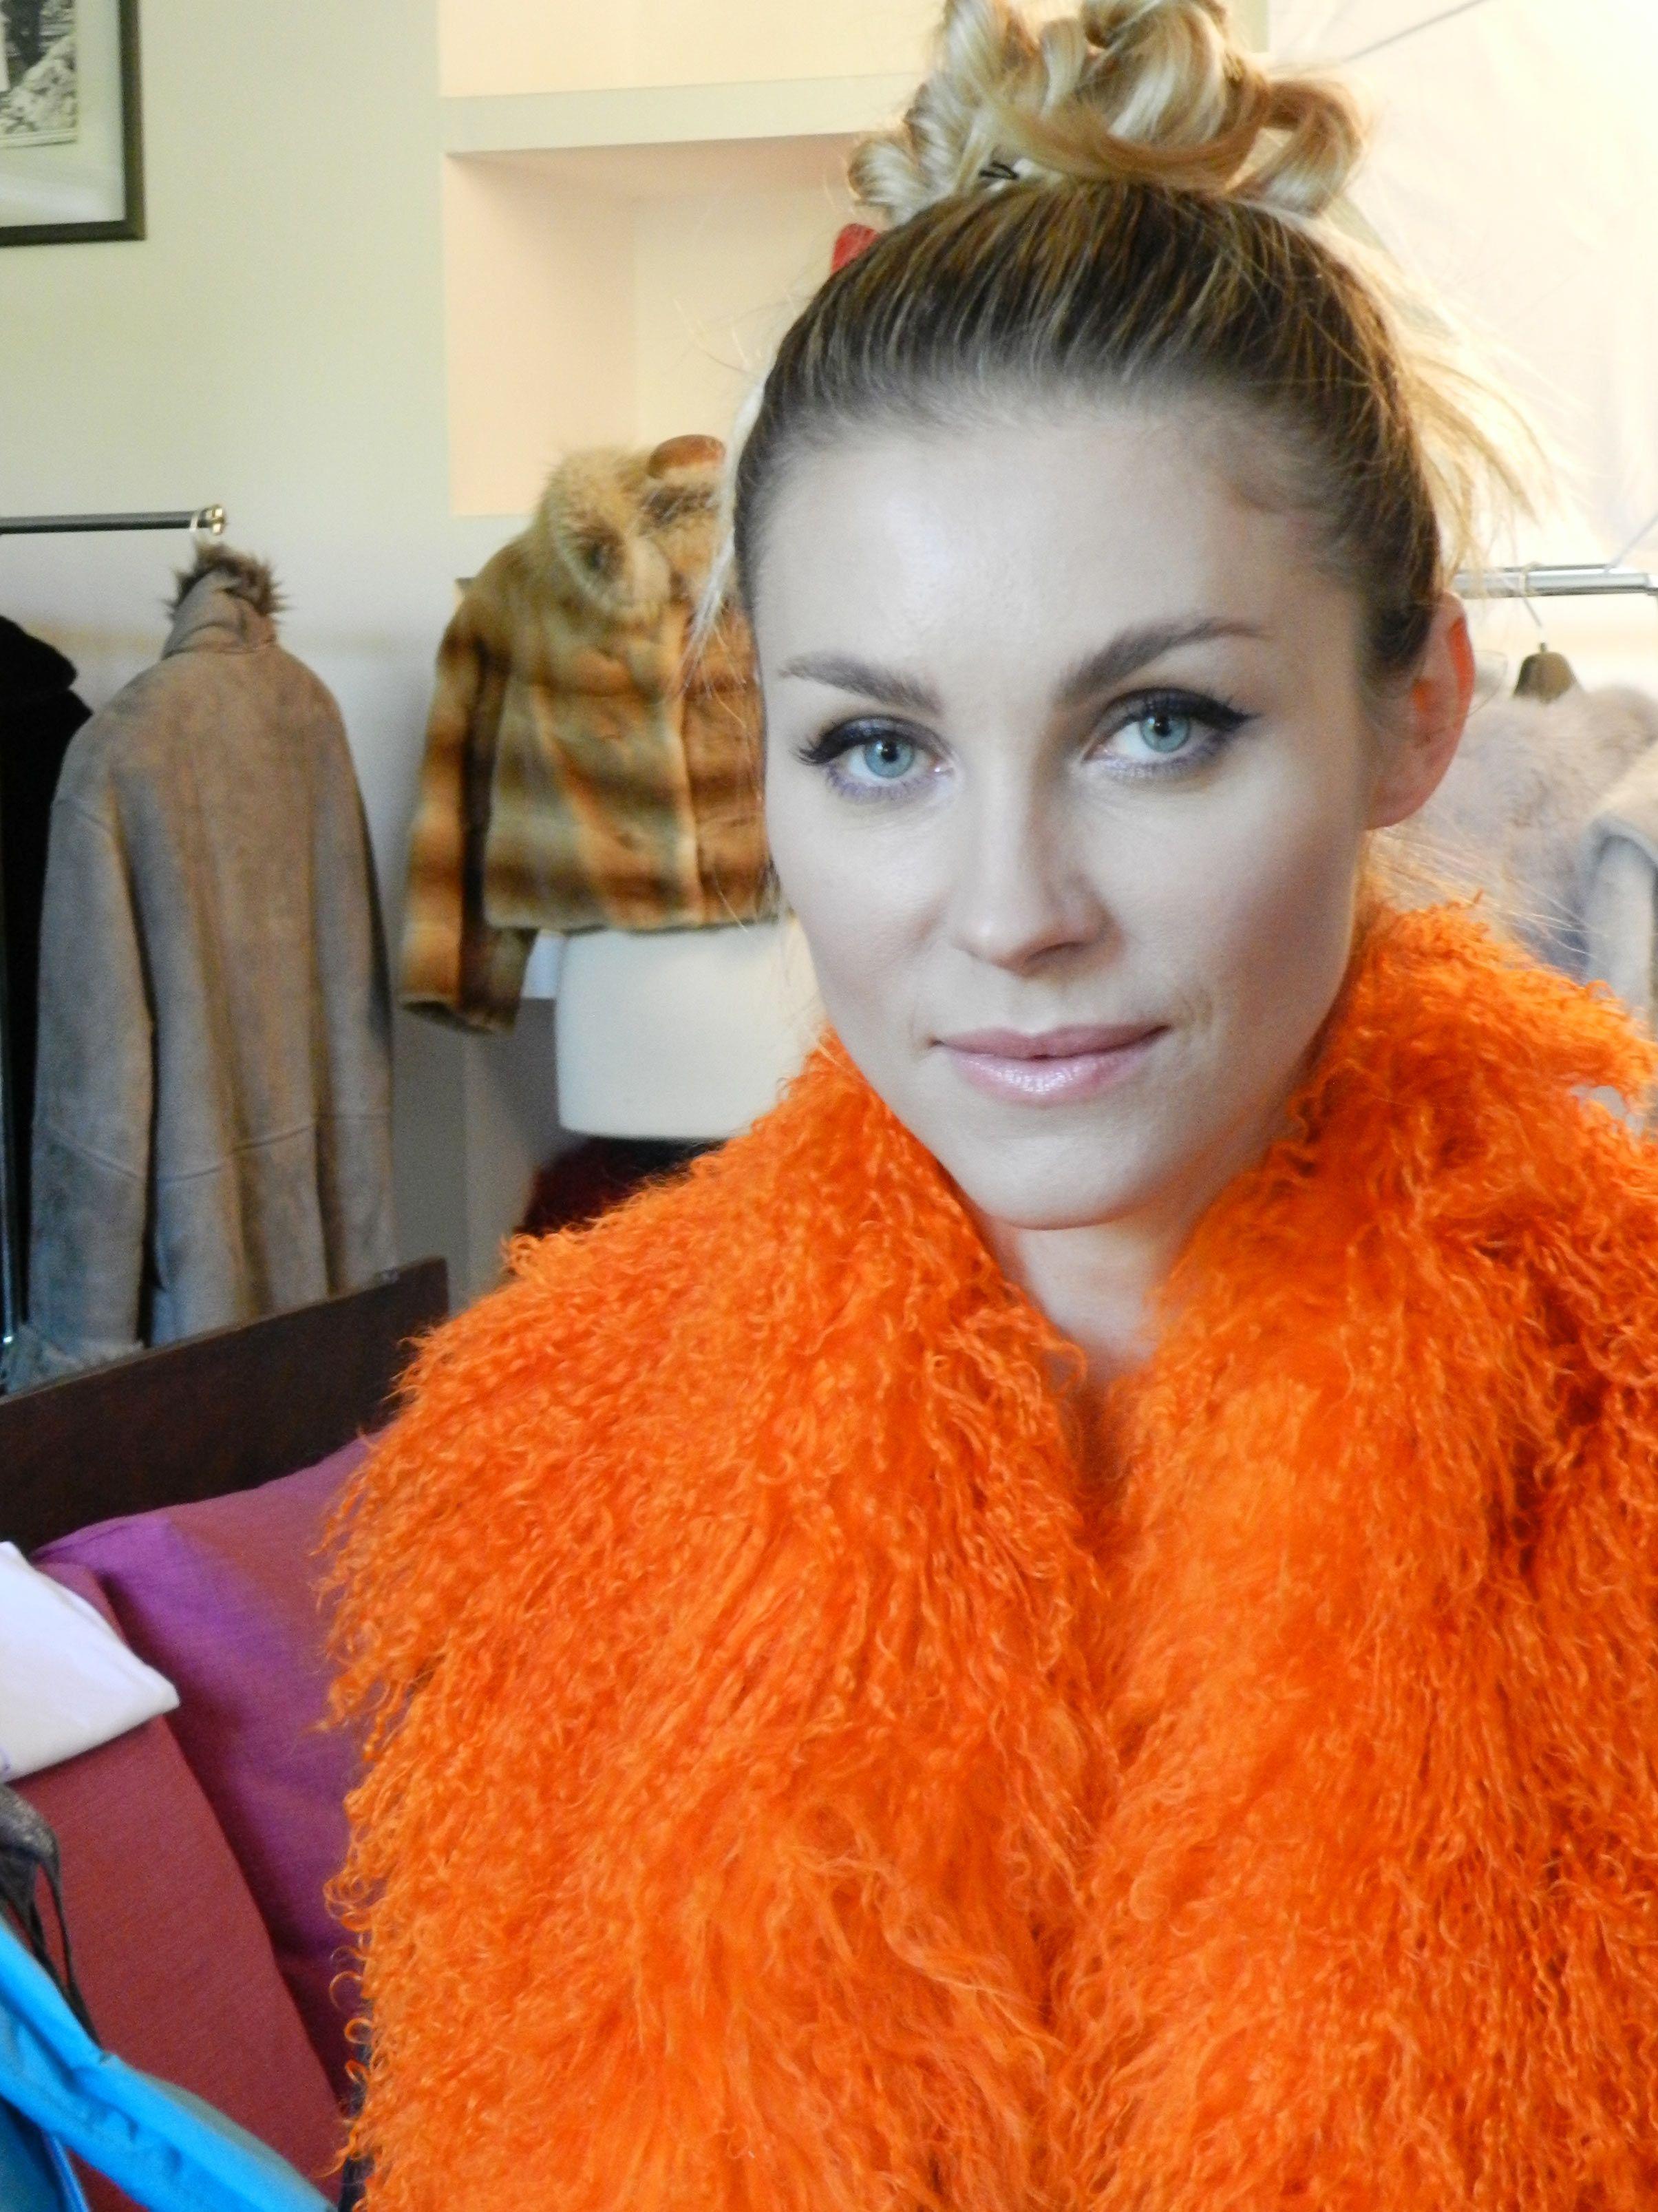 Pellicceria Borello Torino #fur #pelliccia #fourrure #jacket #fashion #mongolia #orange